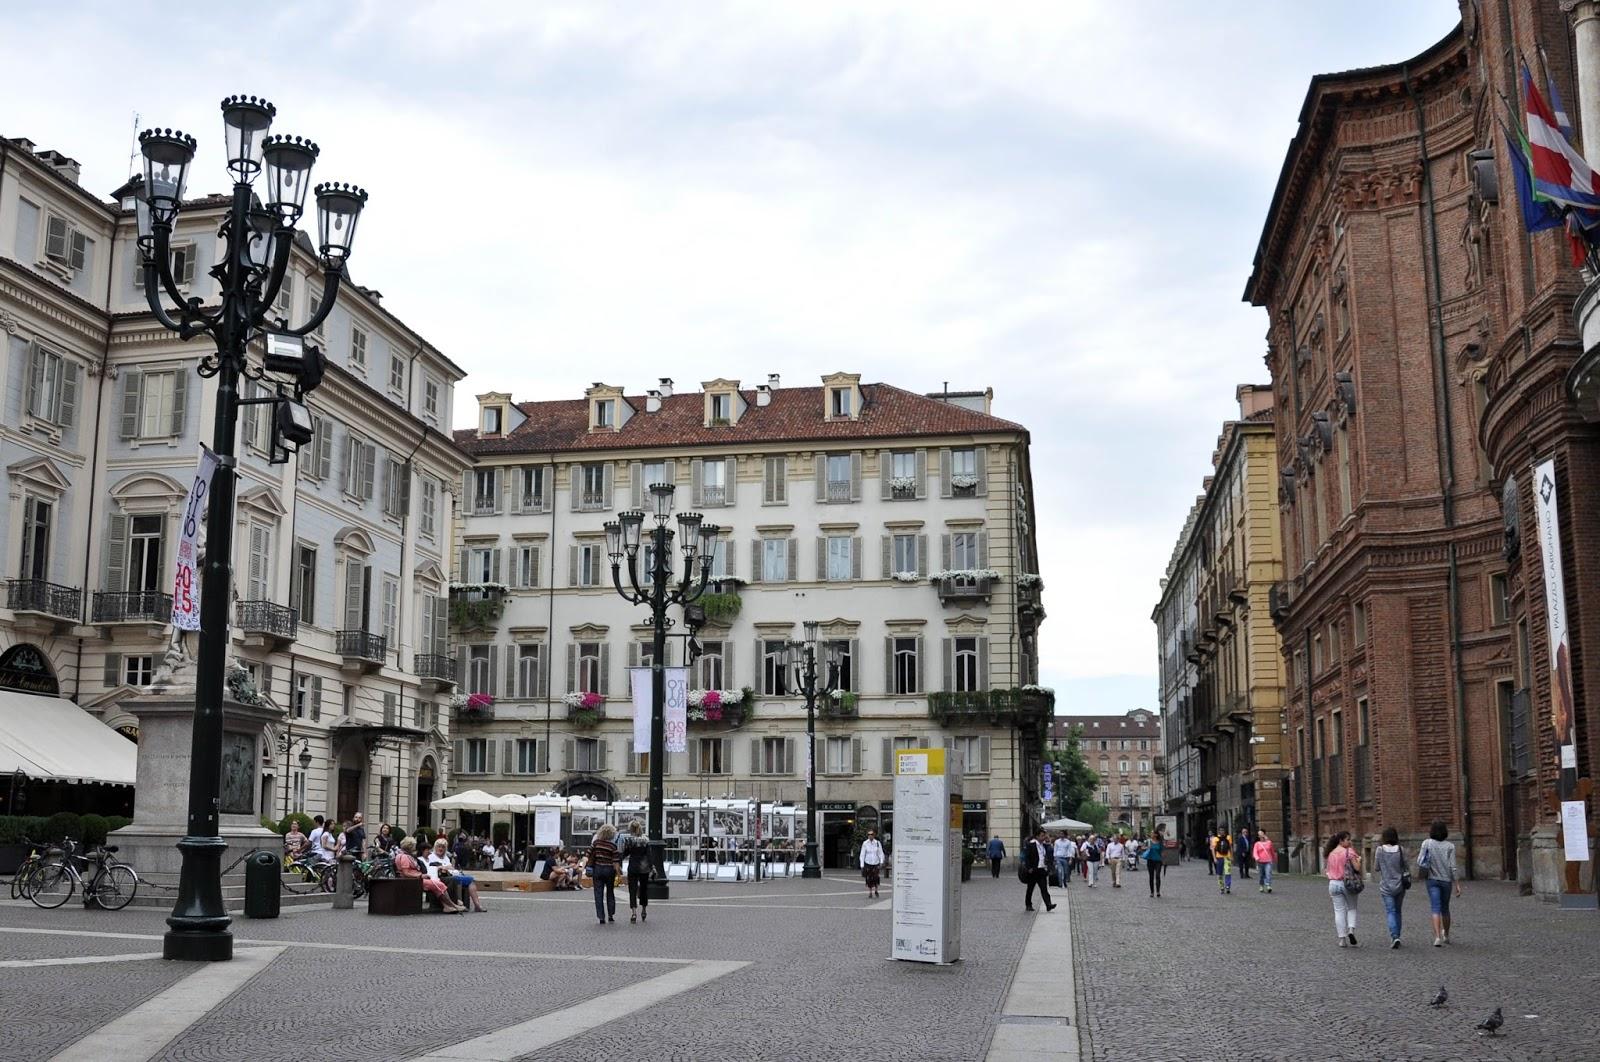 Walking around Turin, Italy